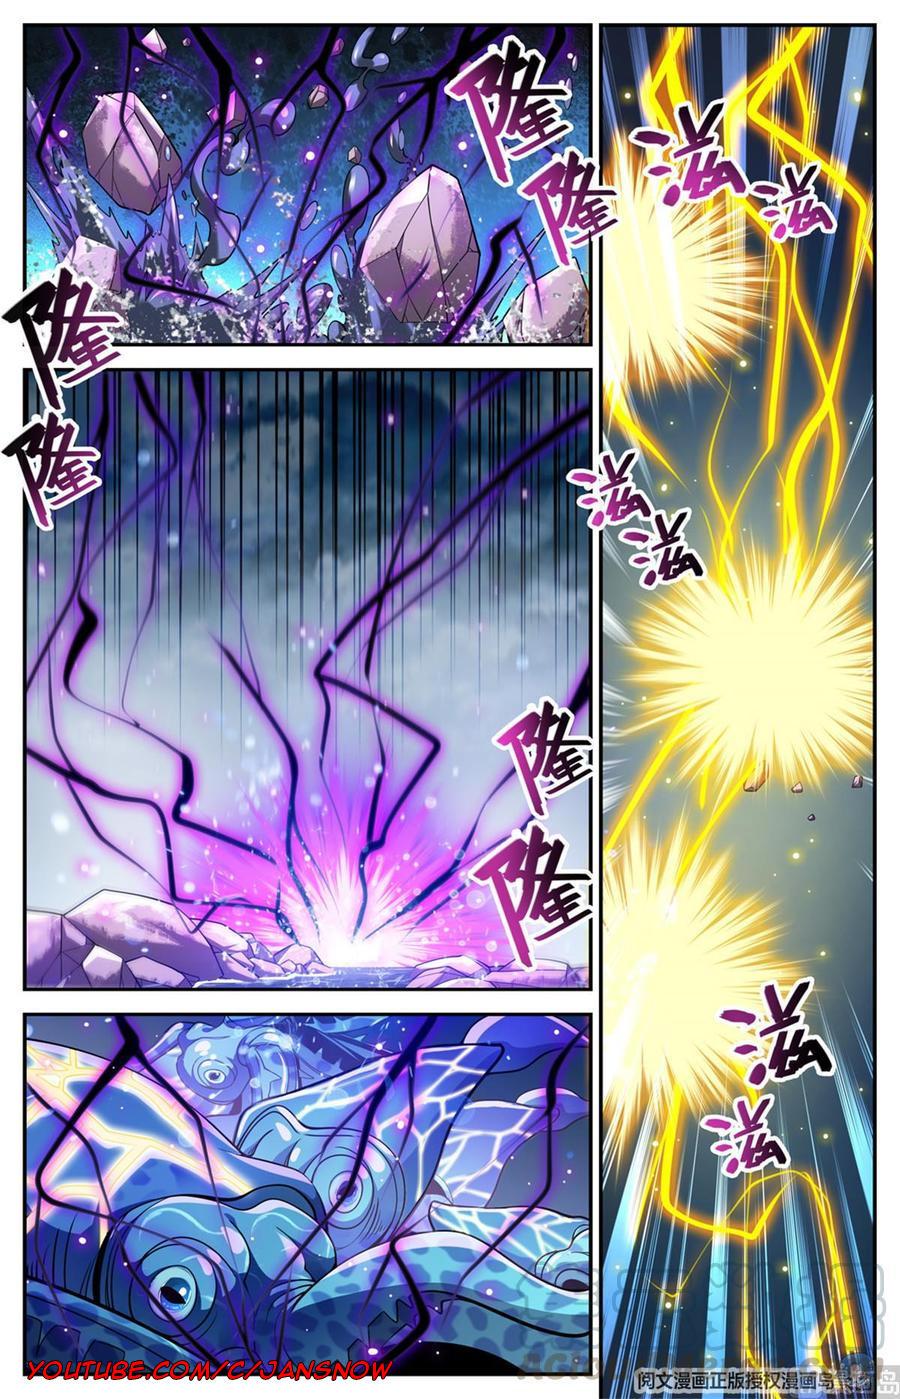 Versatile Mage Chapter 649 page 13 - Mangakakalots.com